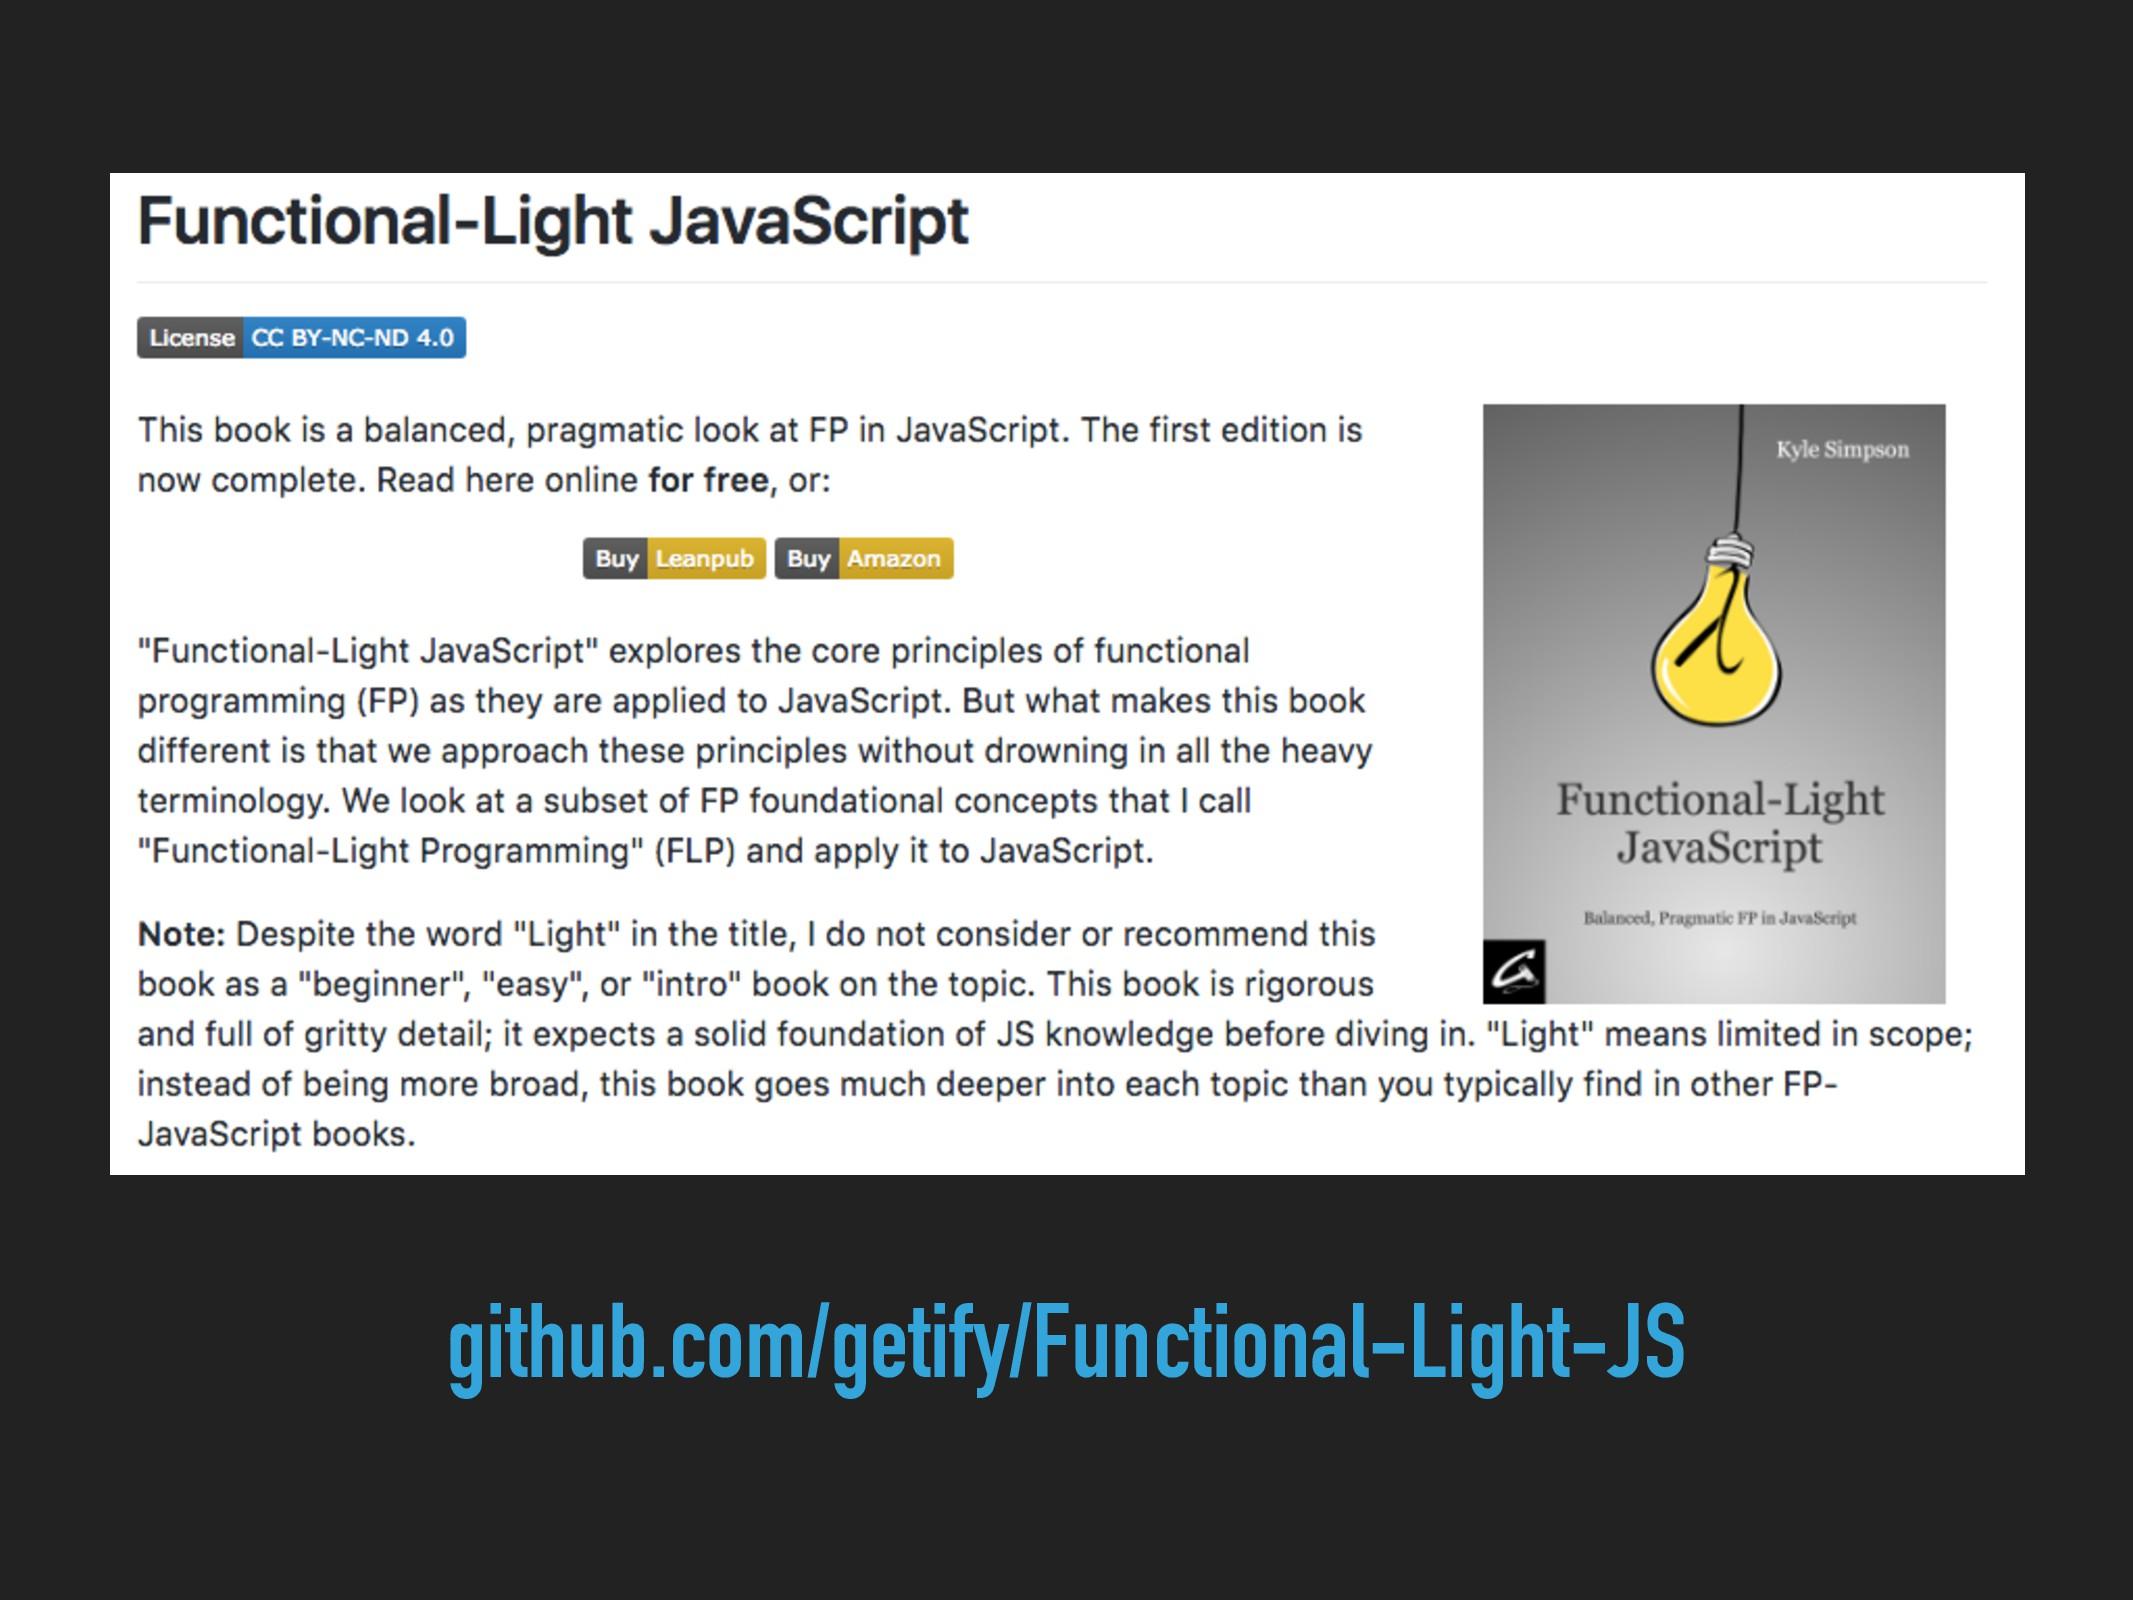 github.com/getify/Functional-Light-JS